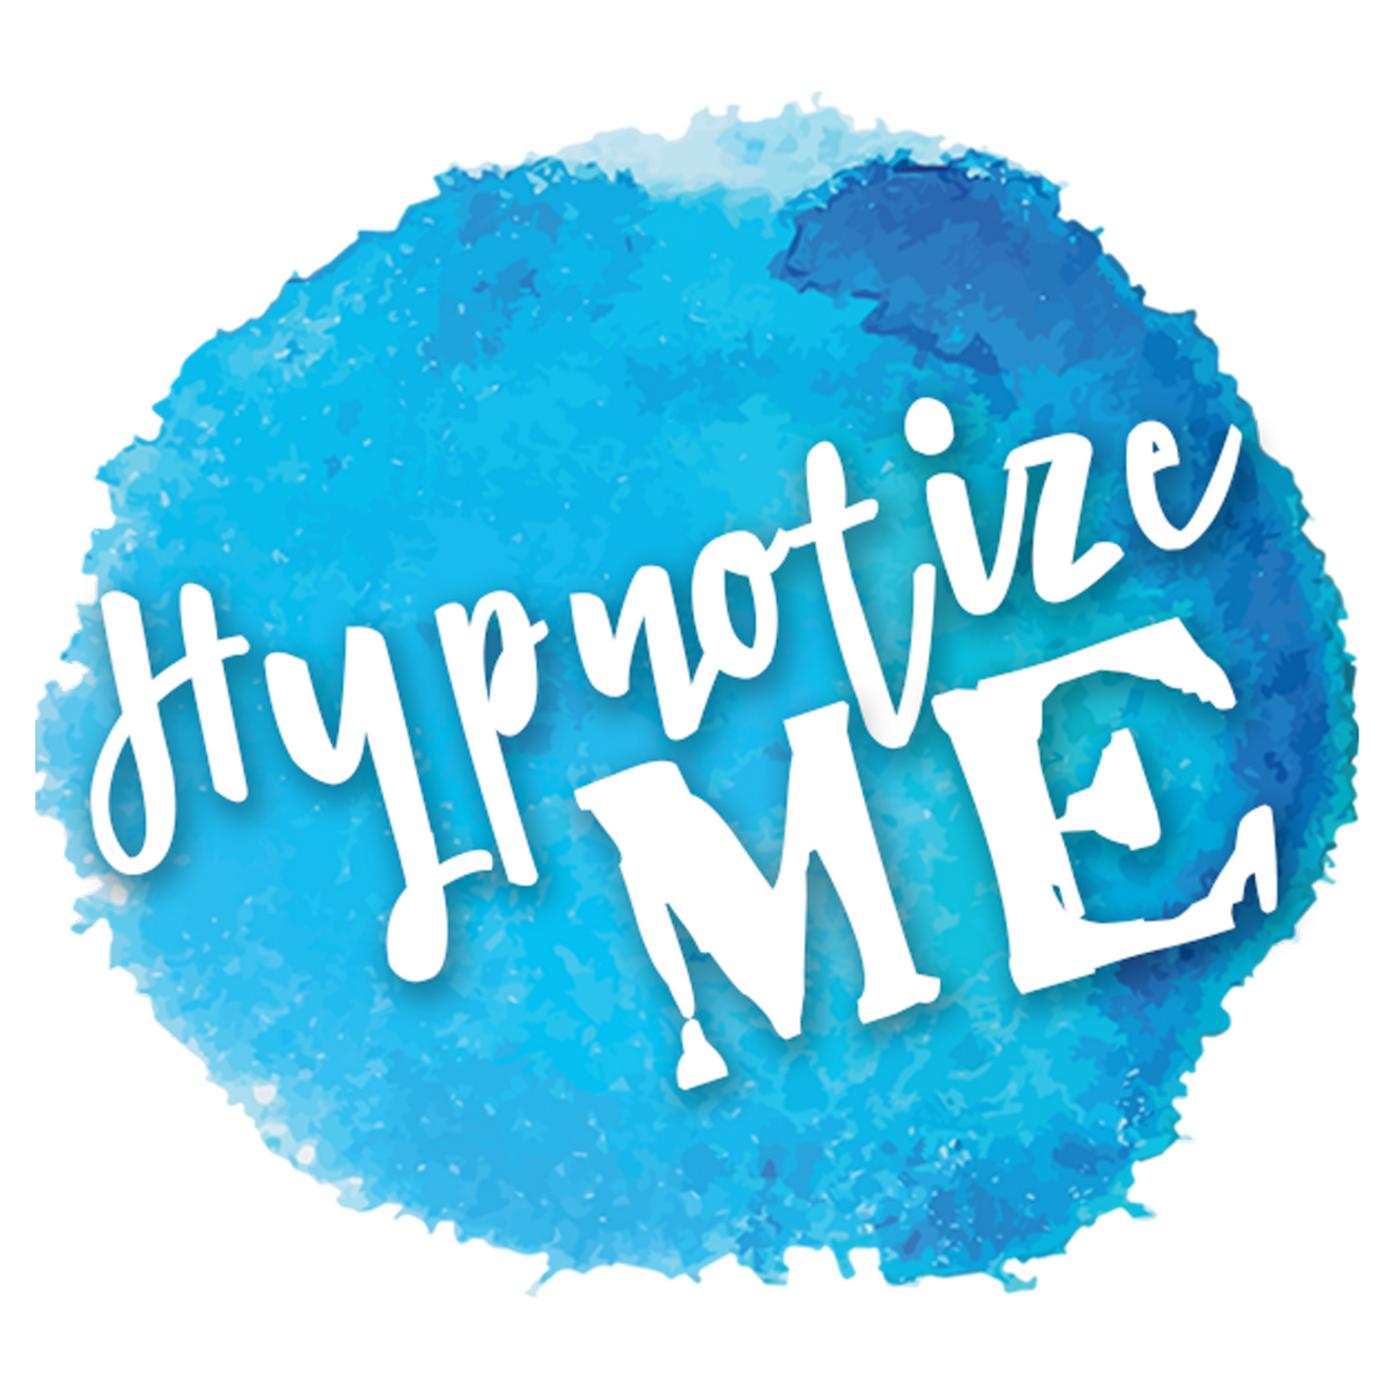 Hypnotize Me | Hypnosis | Transformation | Healing | Mindfulness | Meditation | Psychology | Rapid Change | Dr. Elizabeth Bonet